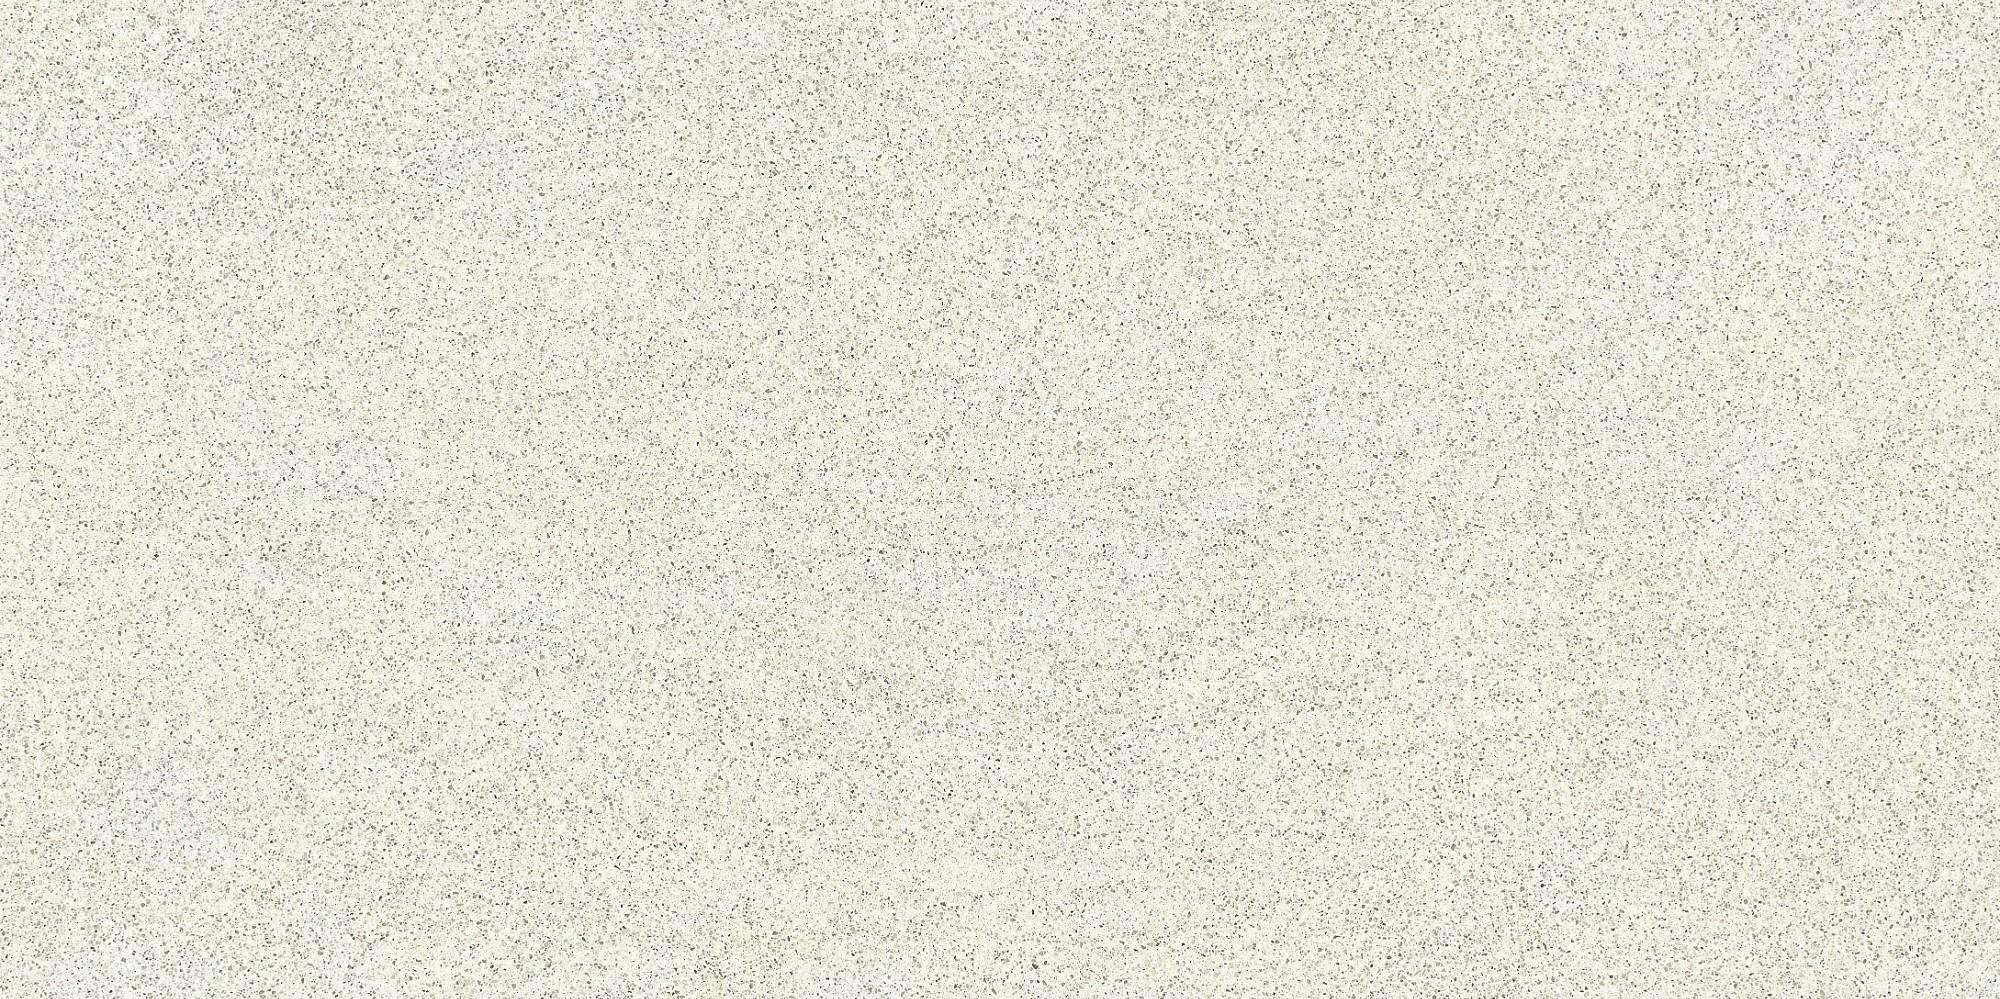 Engineered Quartz Stone Process To Counter Top And Table Top Manufacturers, Engineered Quartz Stone Process To Counter Top And Table Top Factory, Supply Engineered Quartz Stone Process To Counter Top And Table Top